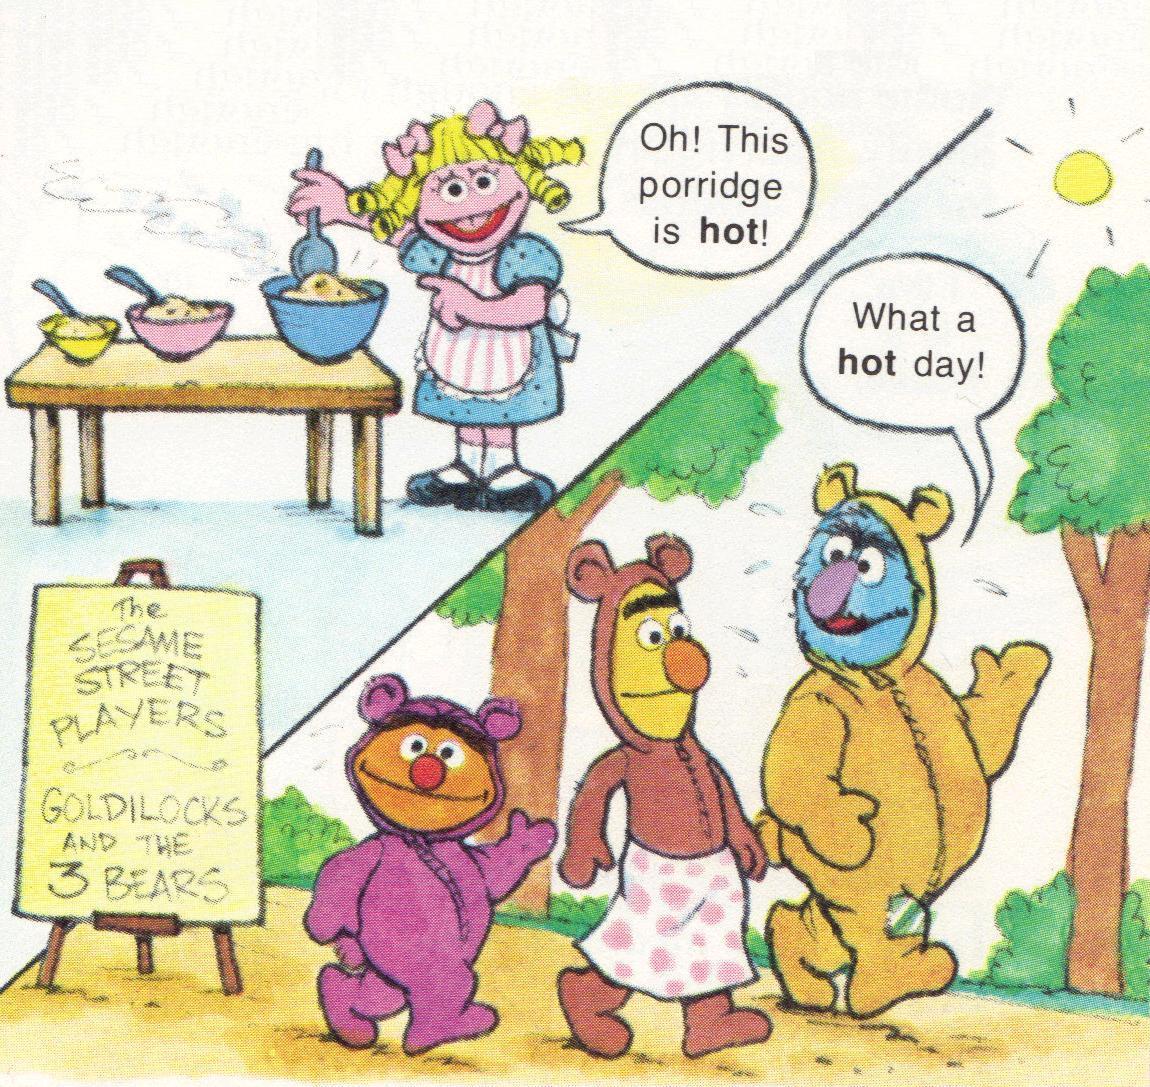 Goldilocks and the Three Bears | Muppet Wiki | FANDOM powered by Wikia